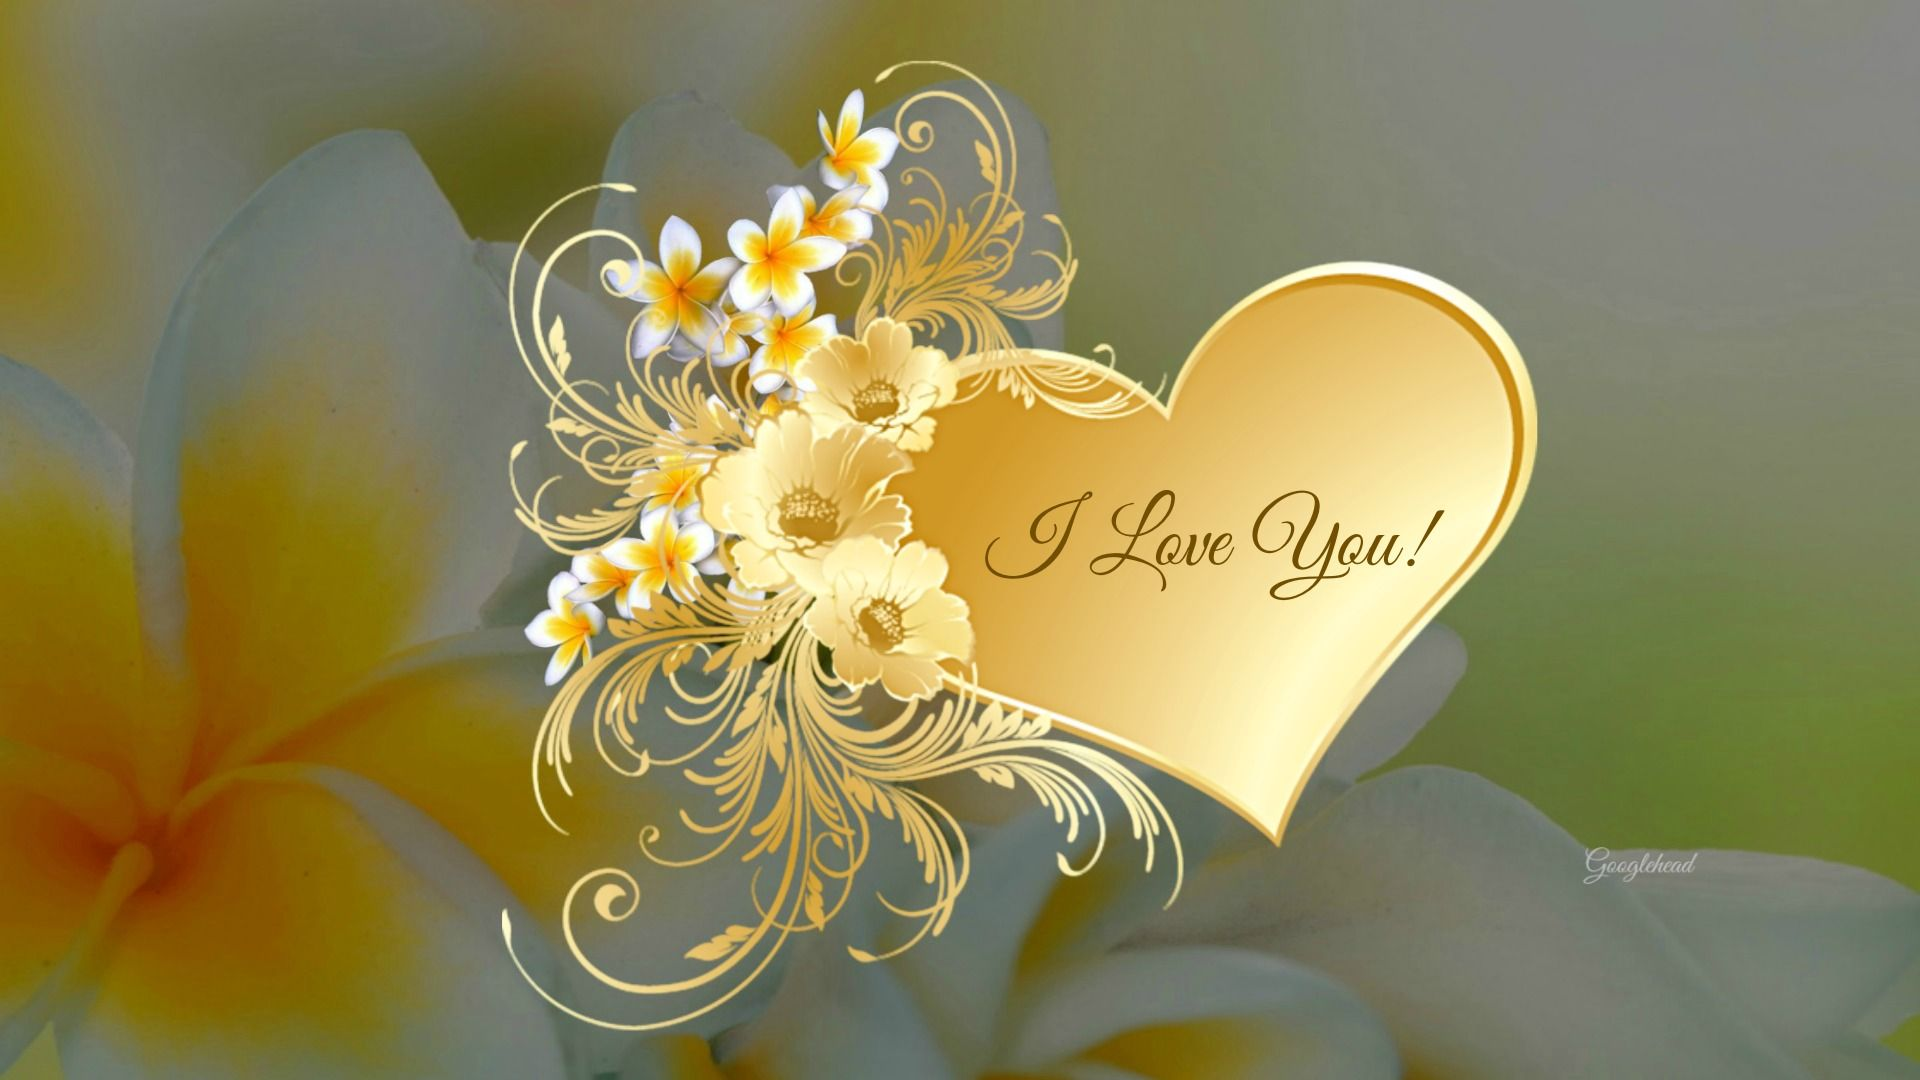 Hd wallpaper i love you - Free Hd I Love You Wallpapers Cute I Love You Images 1920 1080 I Love